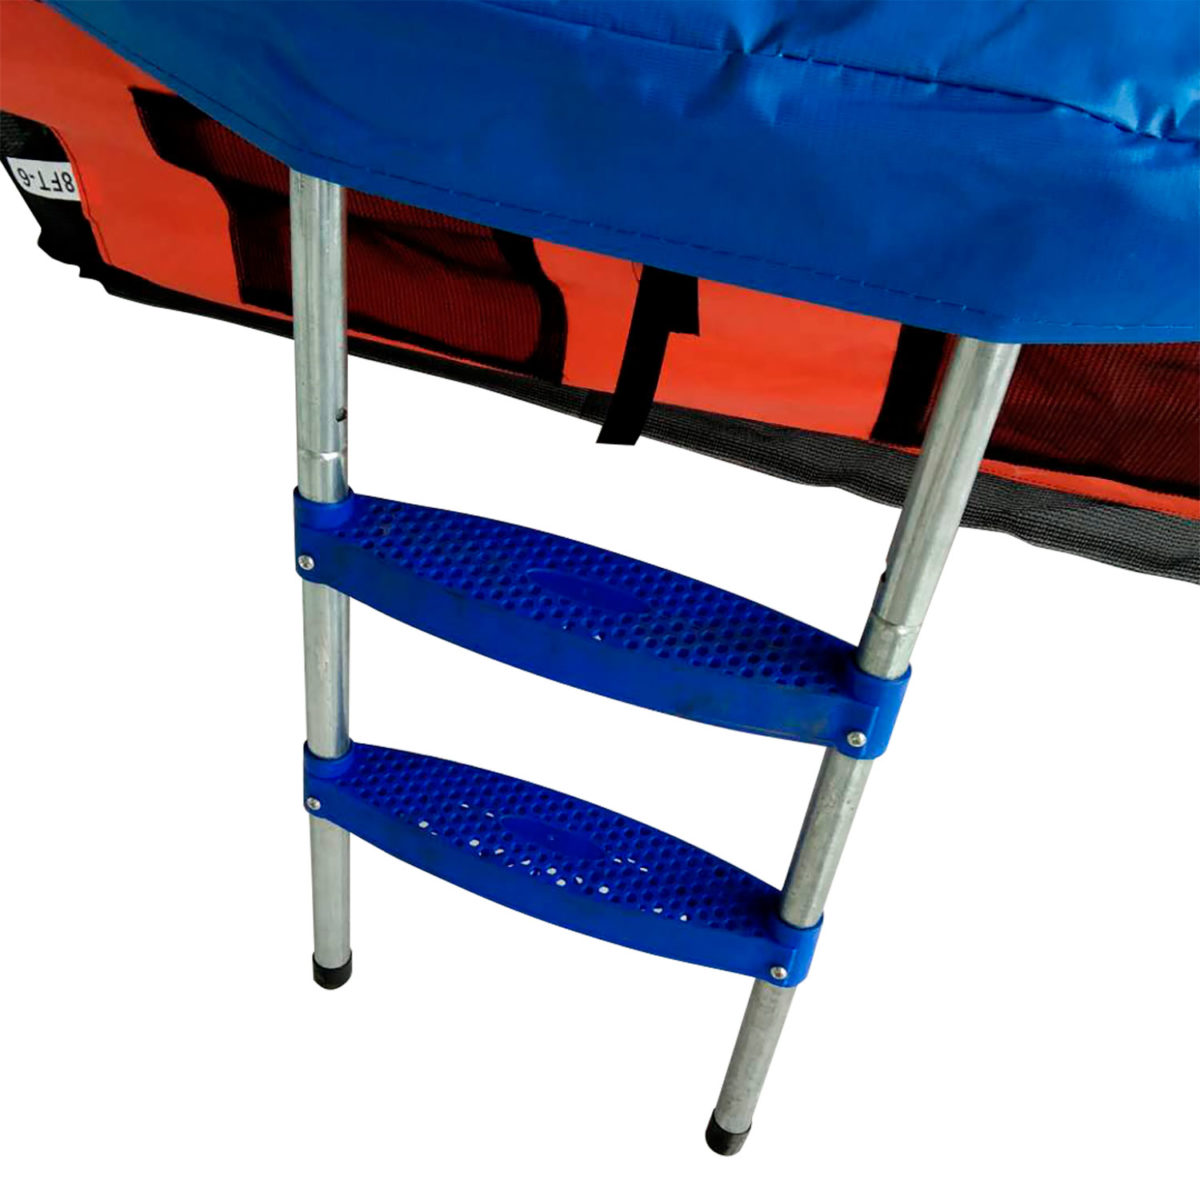 DFC Батут DFC JUMP BASKET с внутр. сеткой, лестница (244 см) - 2